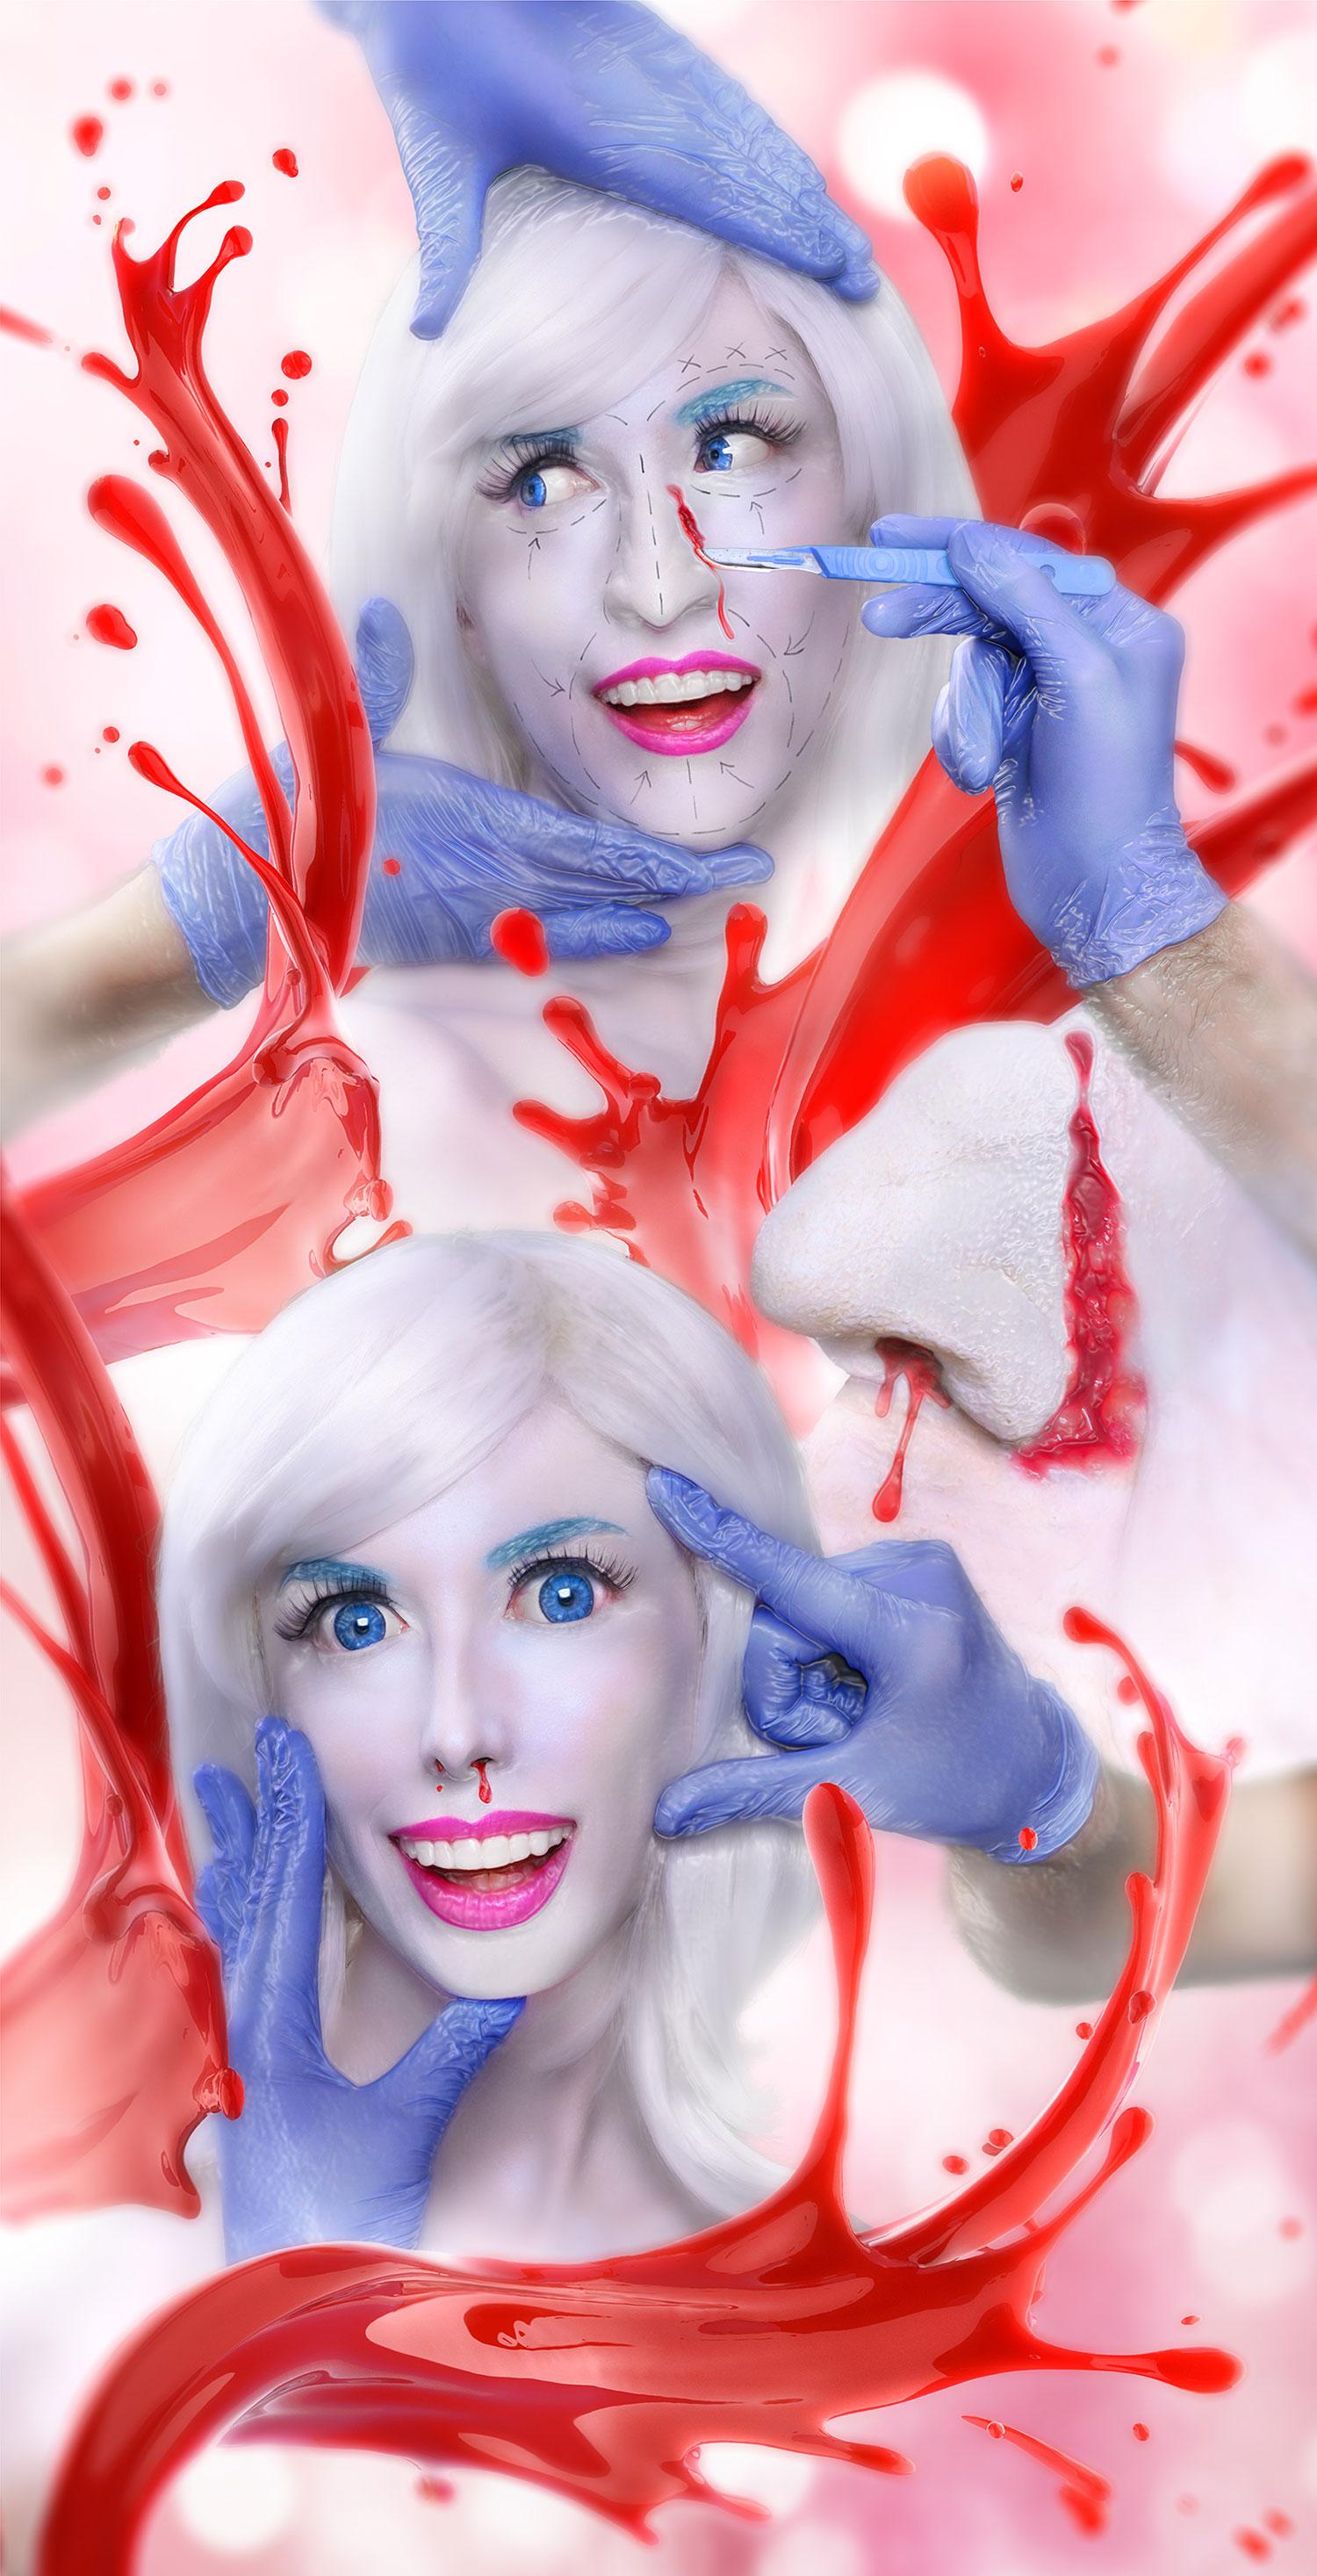 Mending A Face 2019 Rachel Maclean  Lightbox, aluminium frame, 2600 mm x 860 mm  Courtesy of the artist